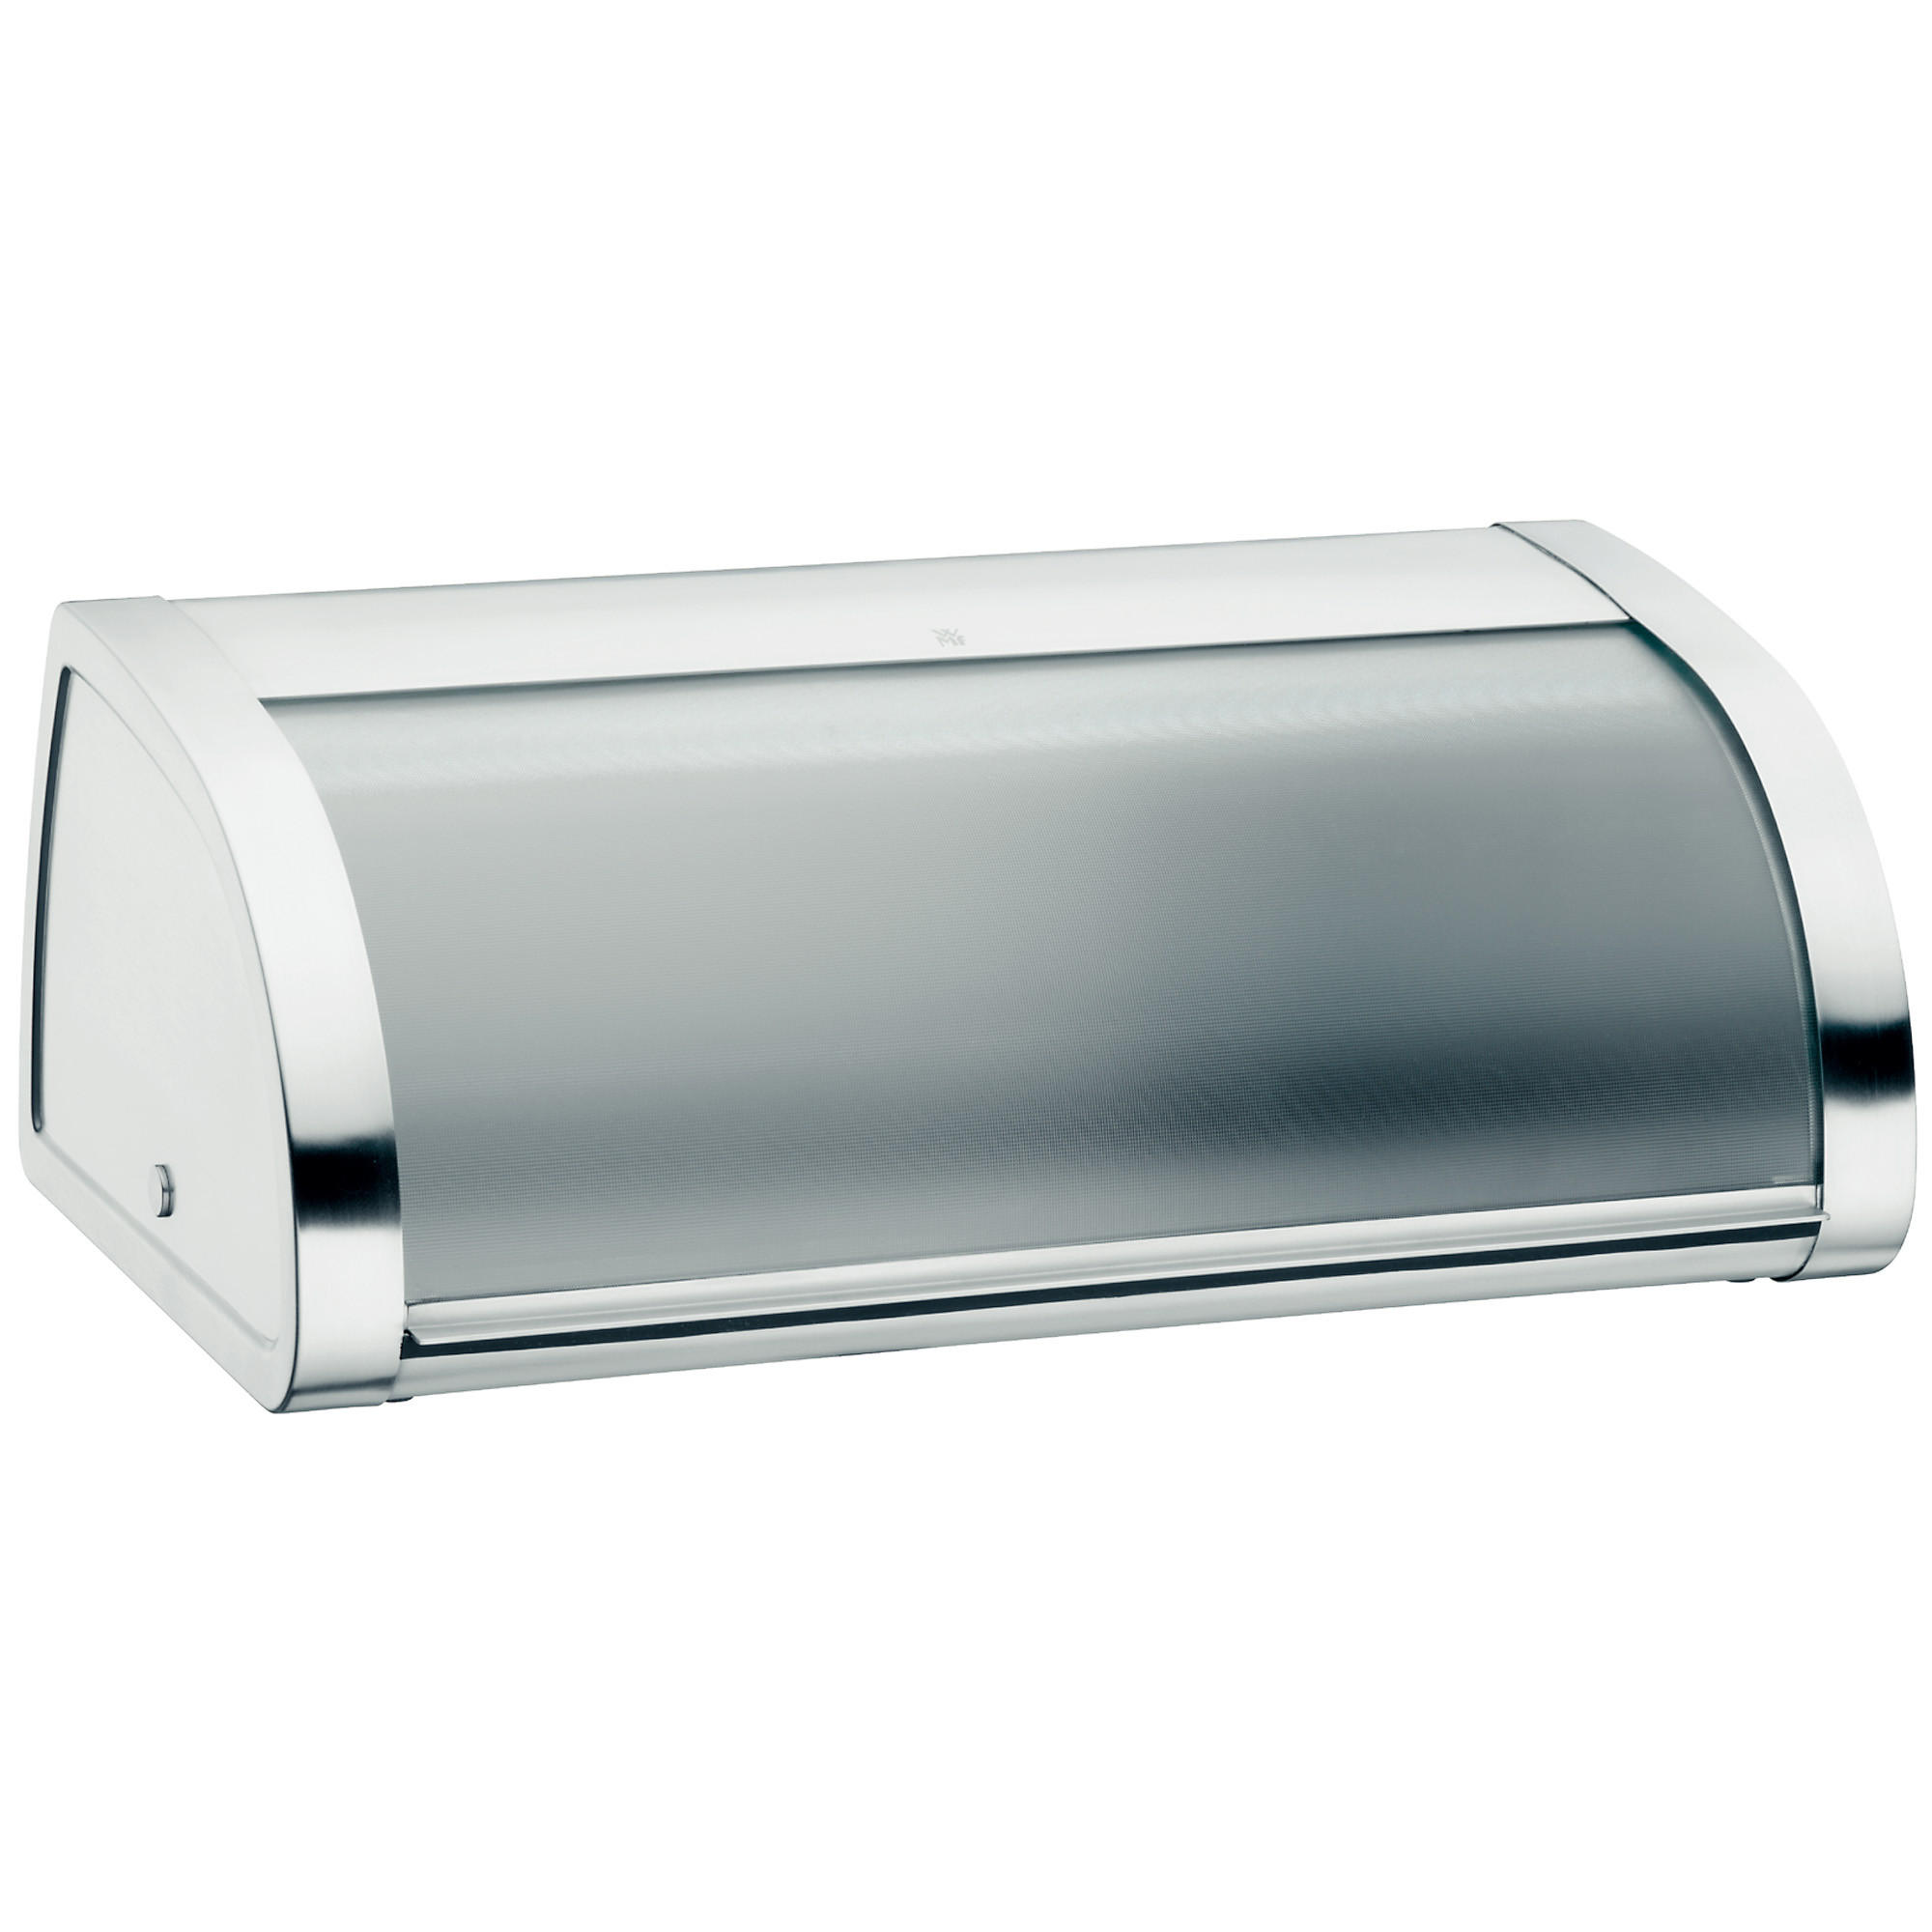 BROTKASTEN - Edelstahlfarben/Transparent, Basics, Glas/Metall (45/28/18cm) - WMF